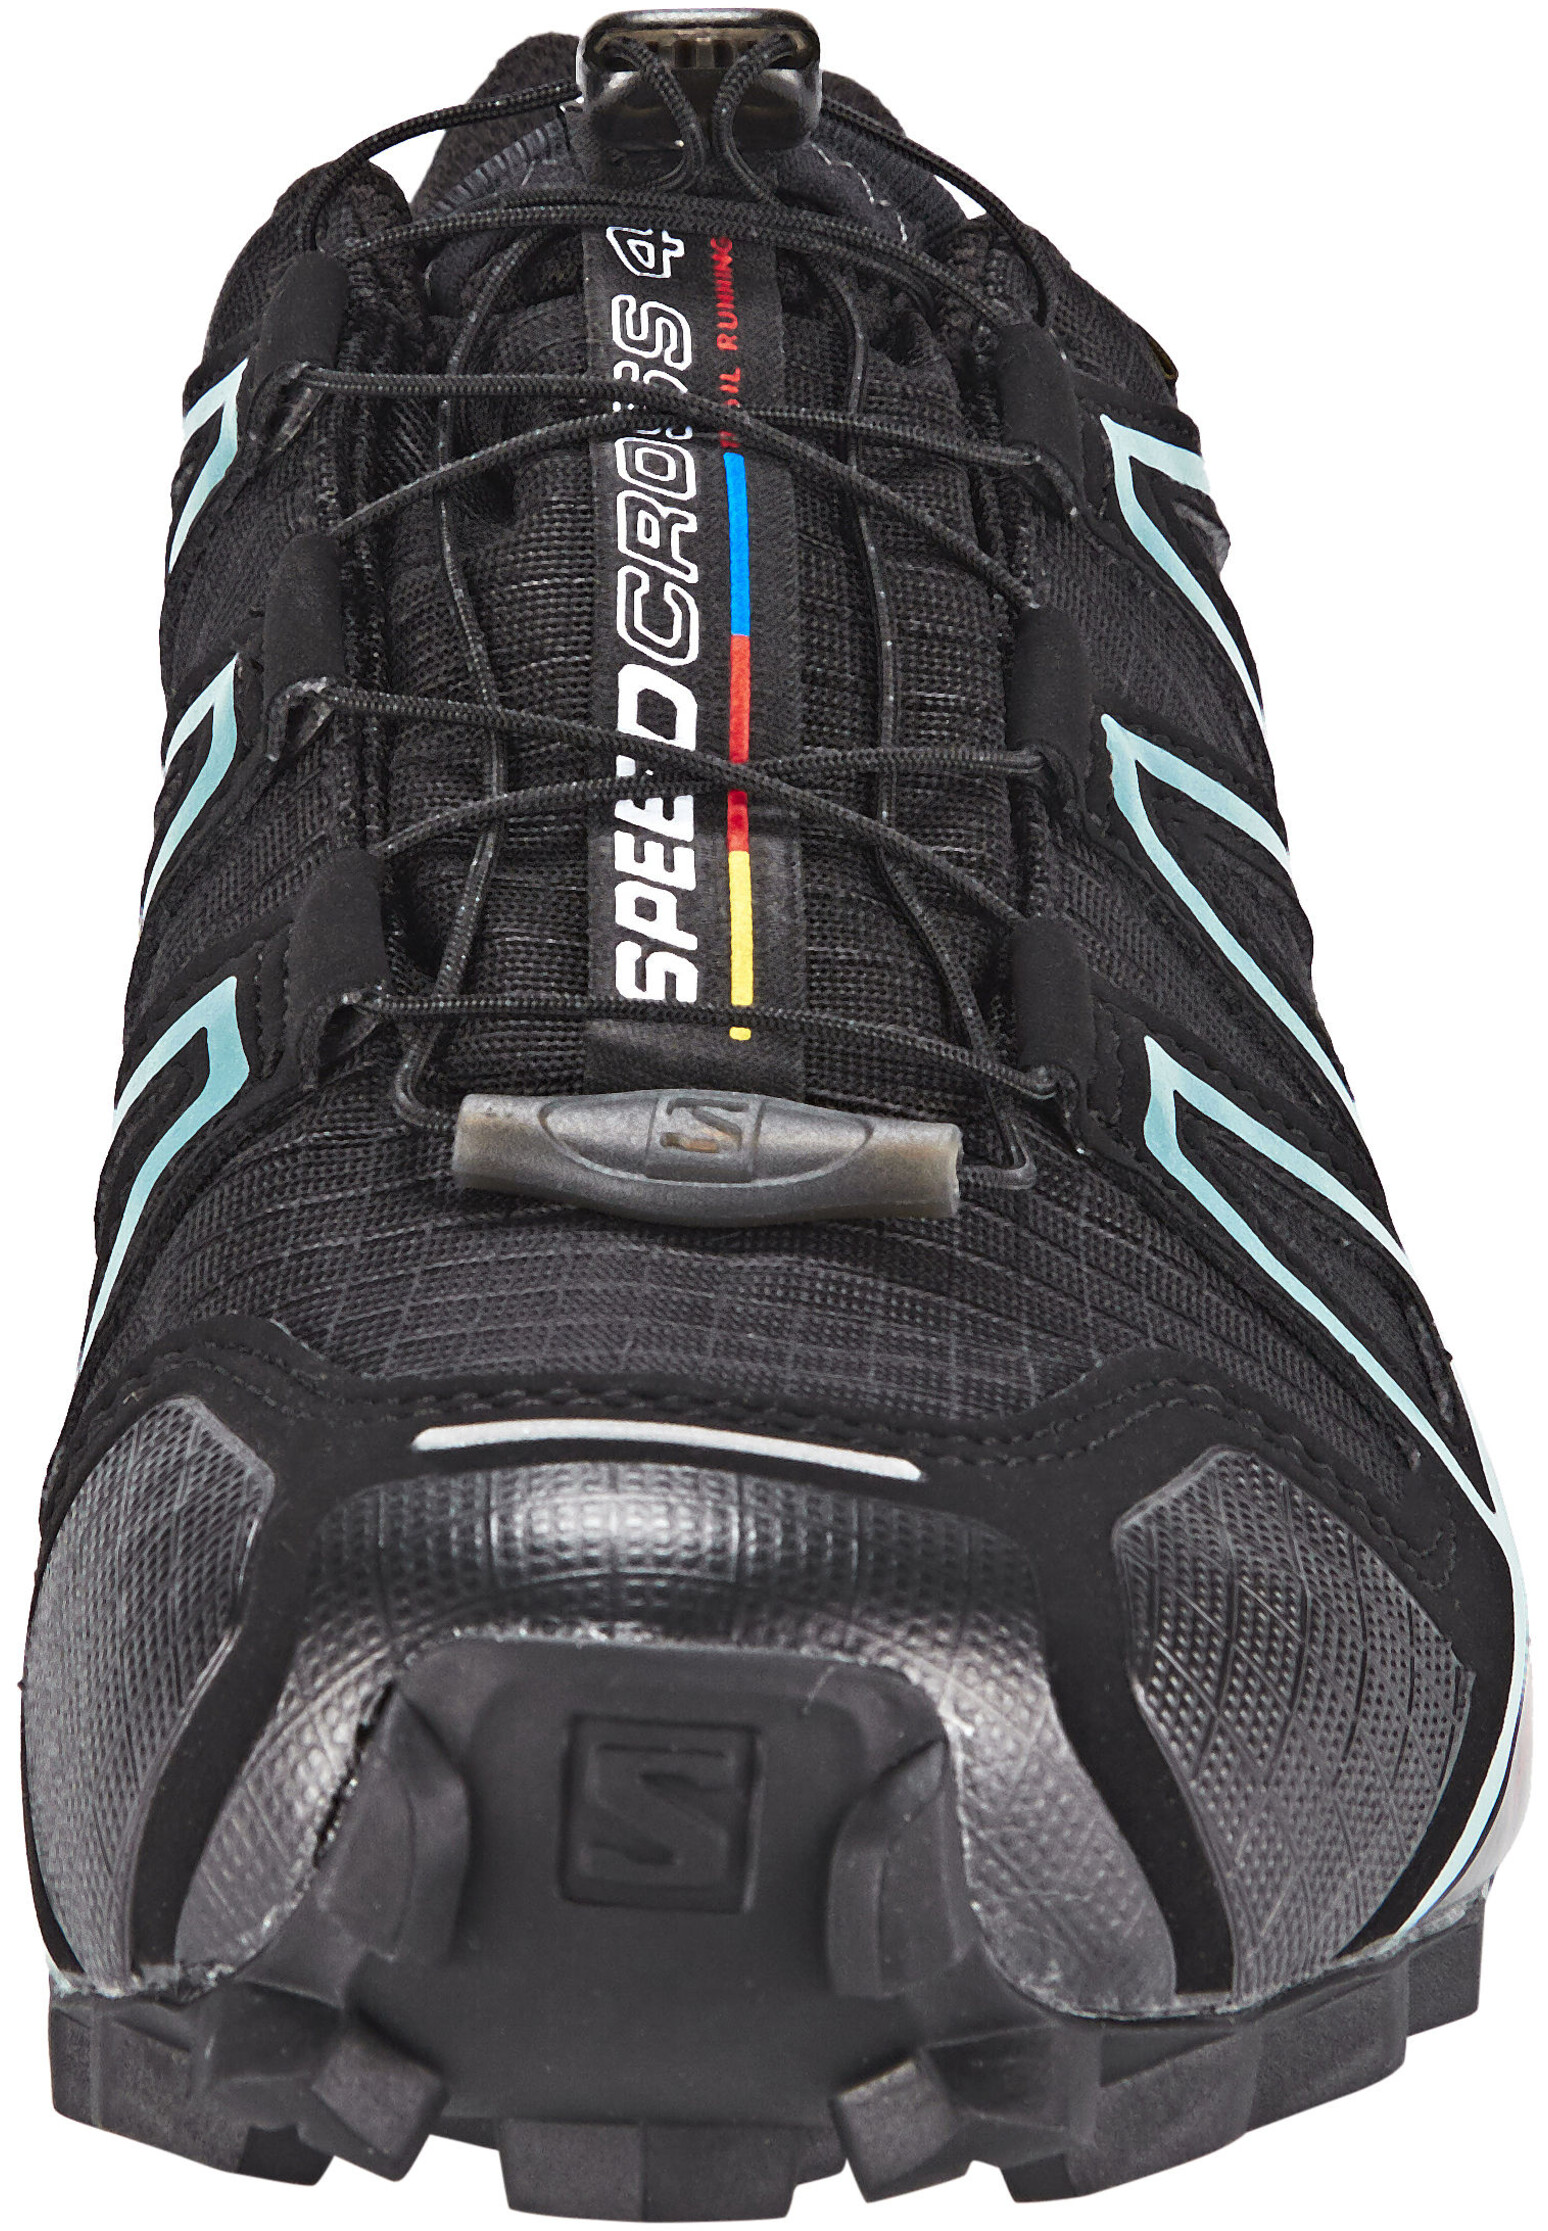 763a35a8ed3 Salomon Speedcross 4 GTX Hardloopschoenen Dames, black/black/metallic  bubble blue